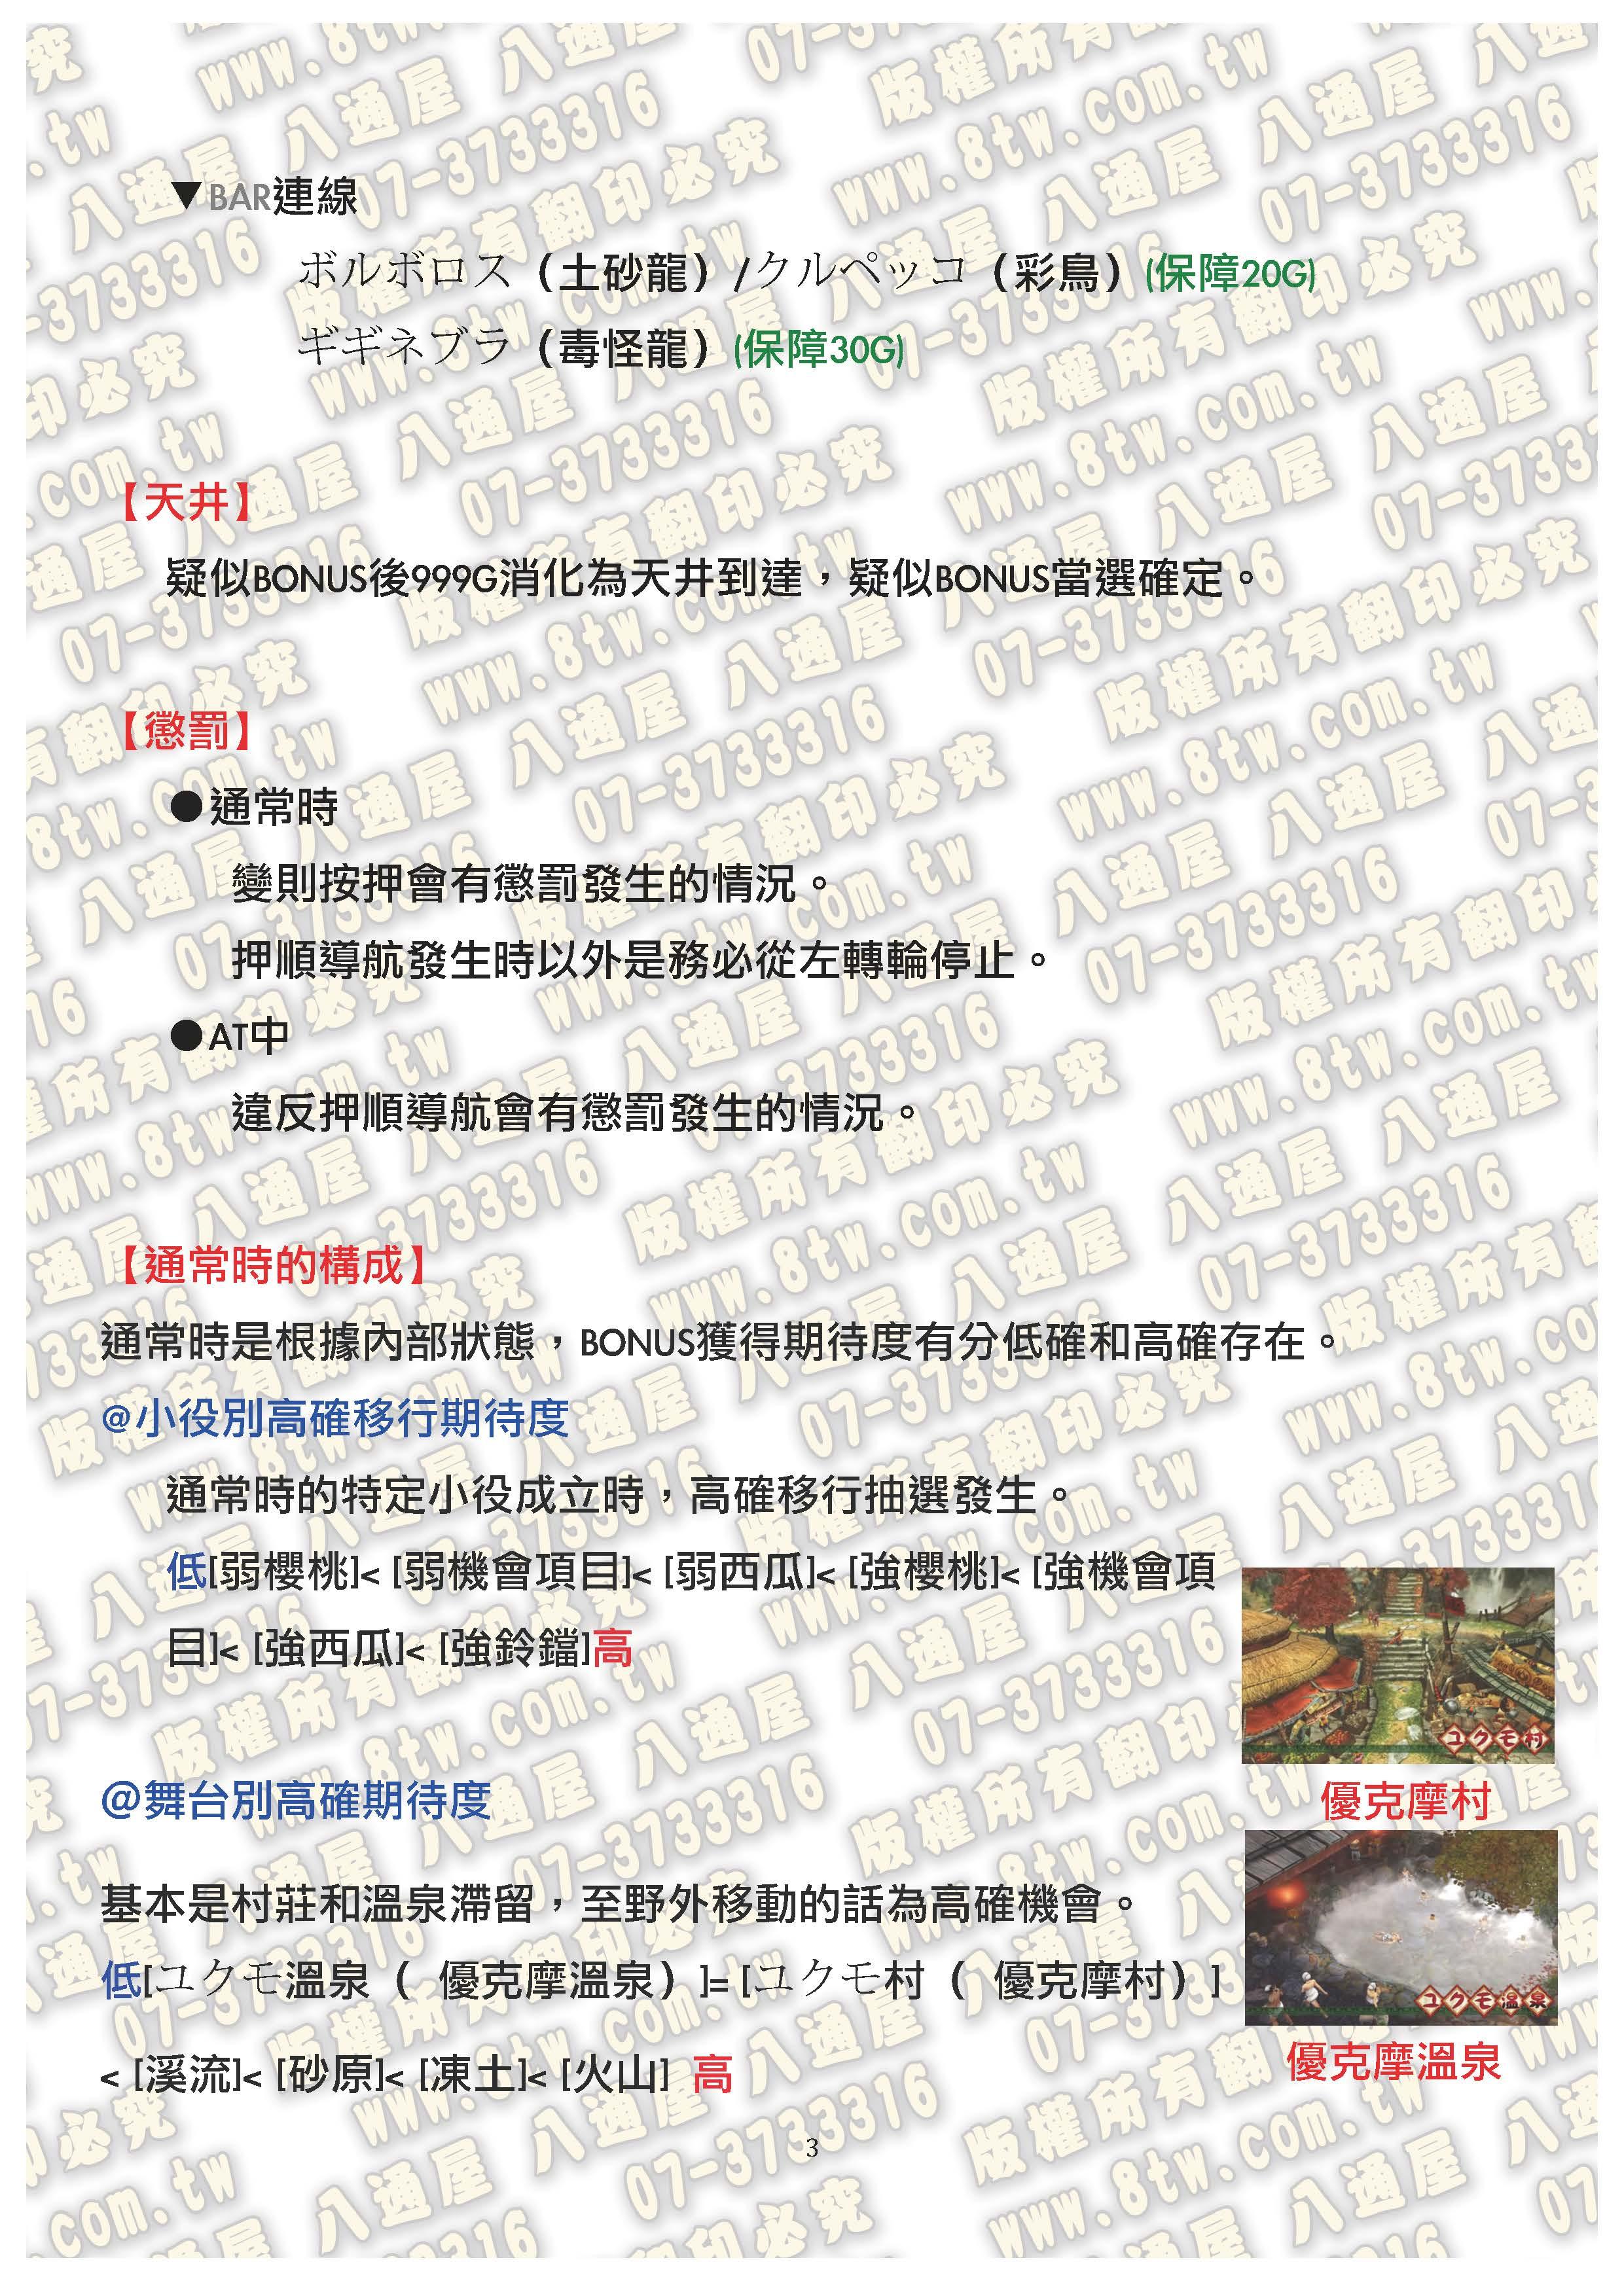 S0202魔物獵人 月下雷鳴 中文版攻略_Page_04